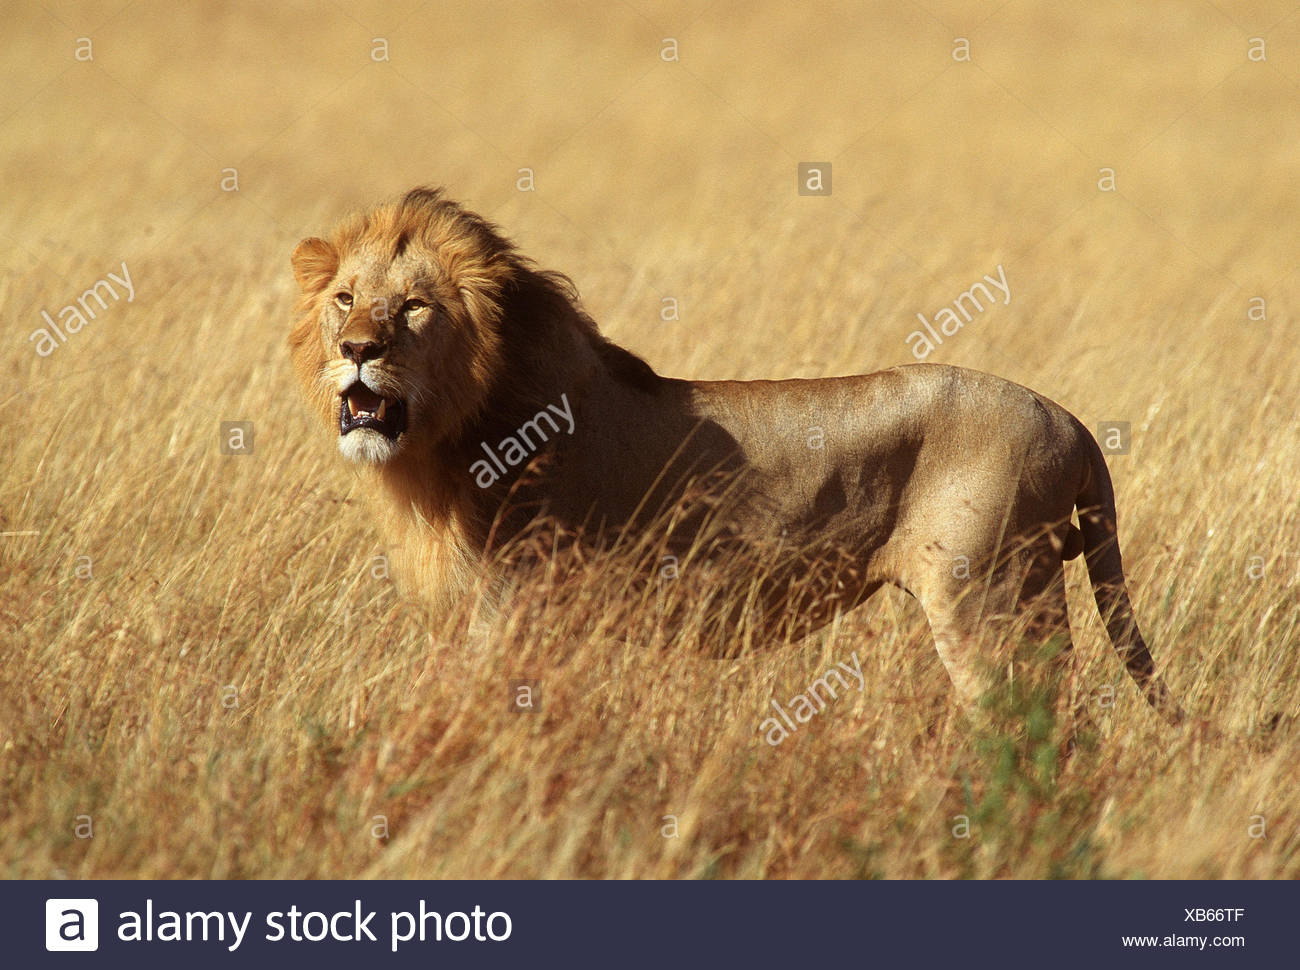 Lion, Serengeti, Africa - Stock Image